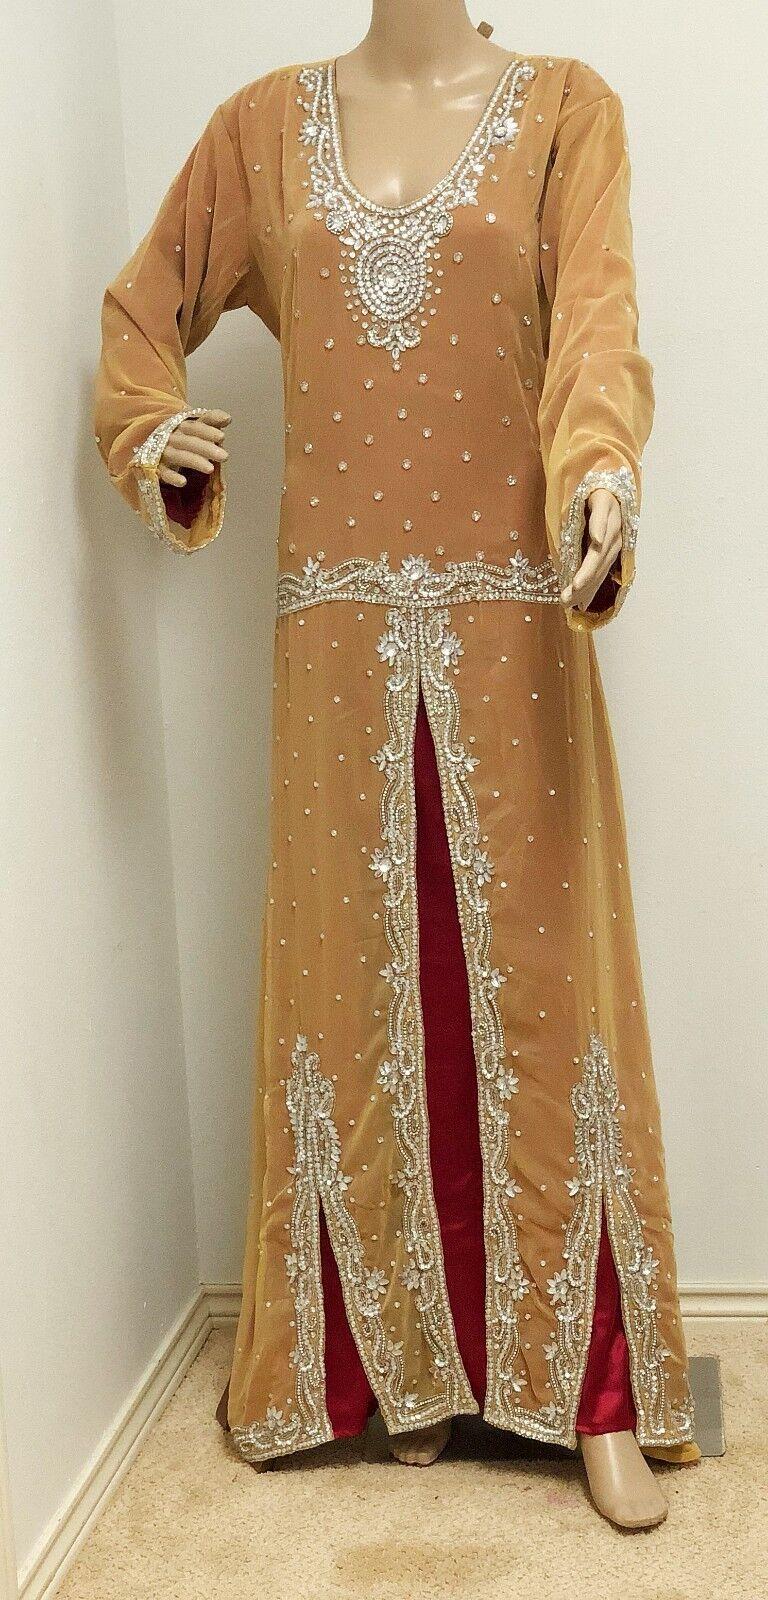 Mink designer Caftan Mgoldccan Jilbab Maxi women's Dress wedding dress gown long